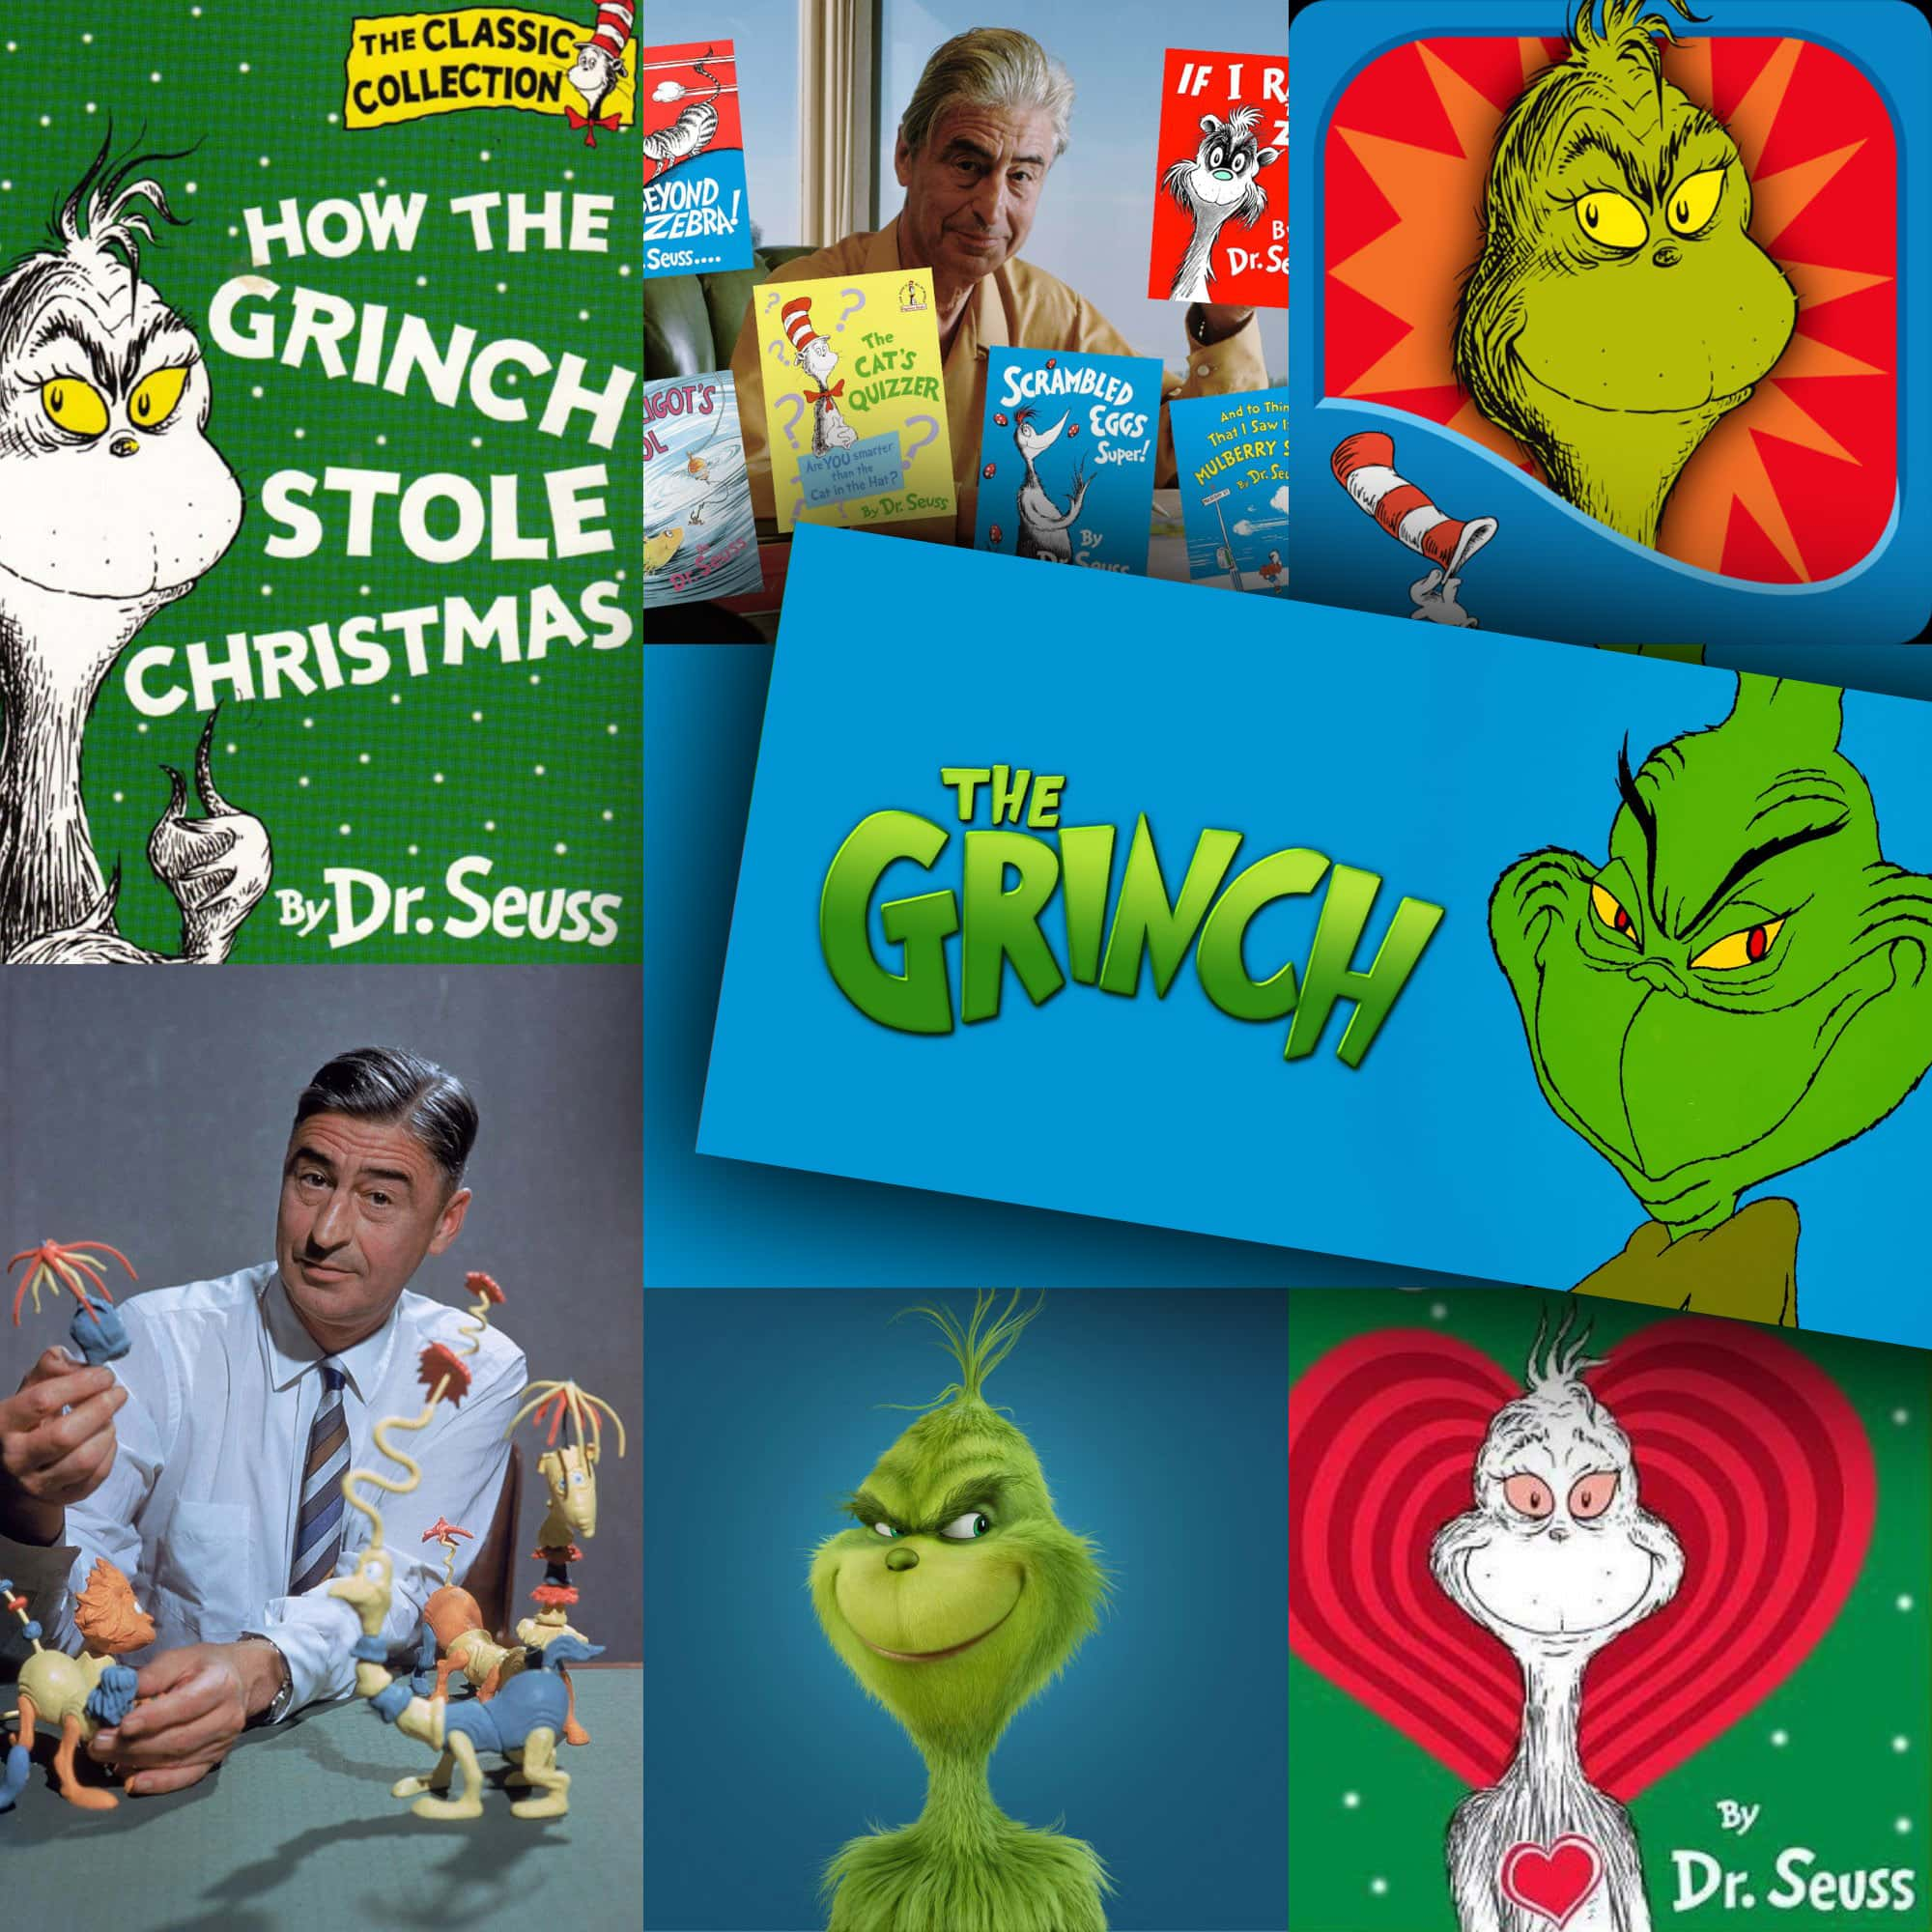 Dr. Seuss Como o Grinch roubou o Natal! livro famoso de RUNWAY MAGAZINE